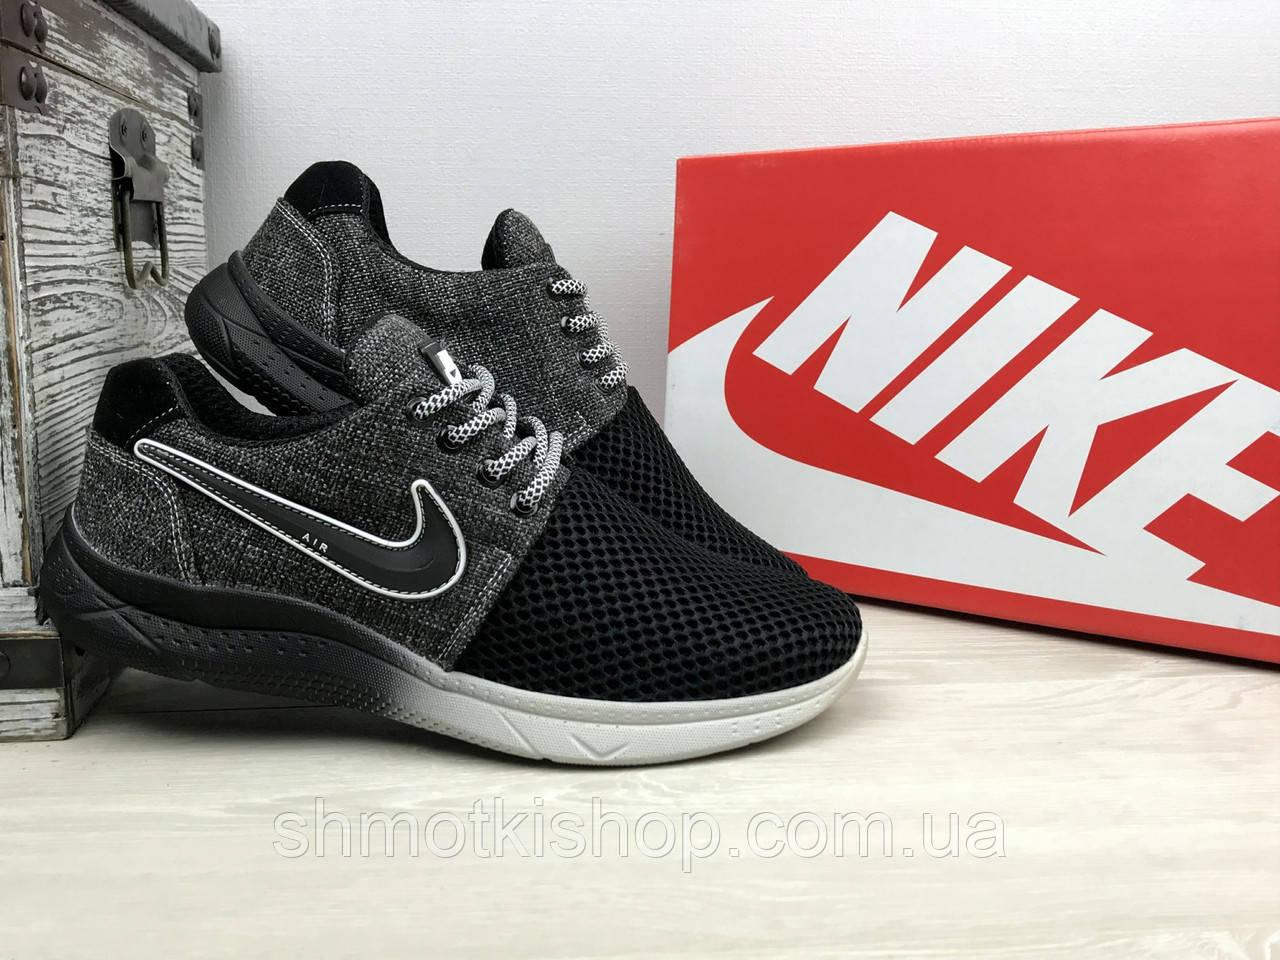 0b3a9727 Кроссовки CrosSAV 41 (Nike Roshe Run) (лето, мужские, текстиль, черный